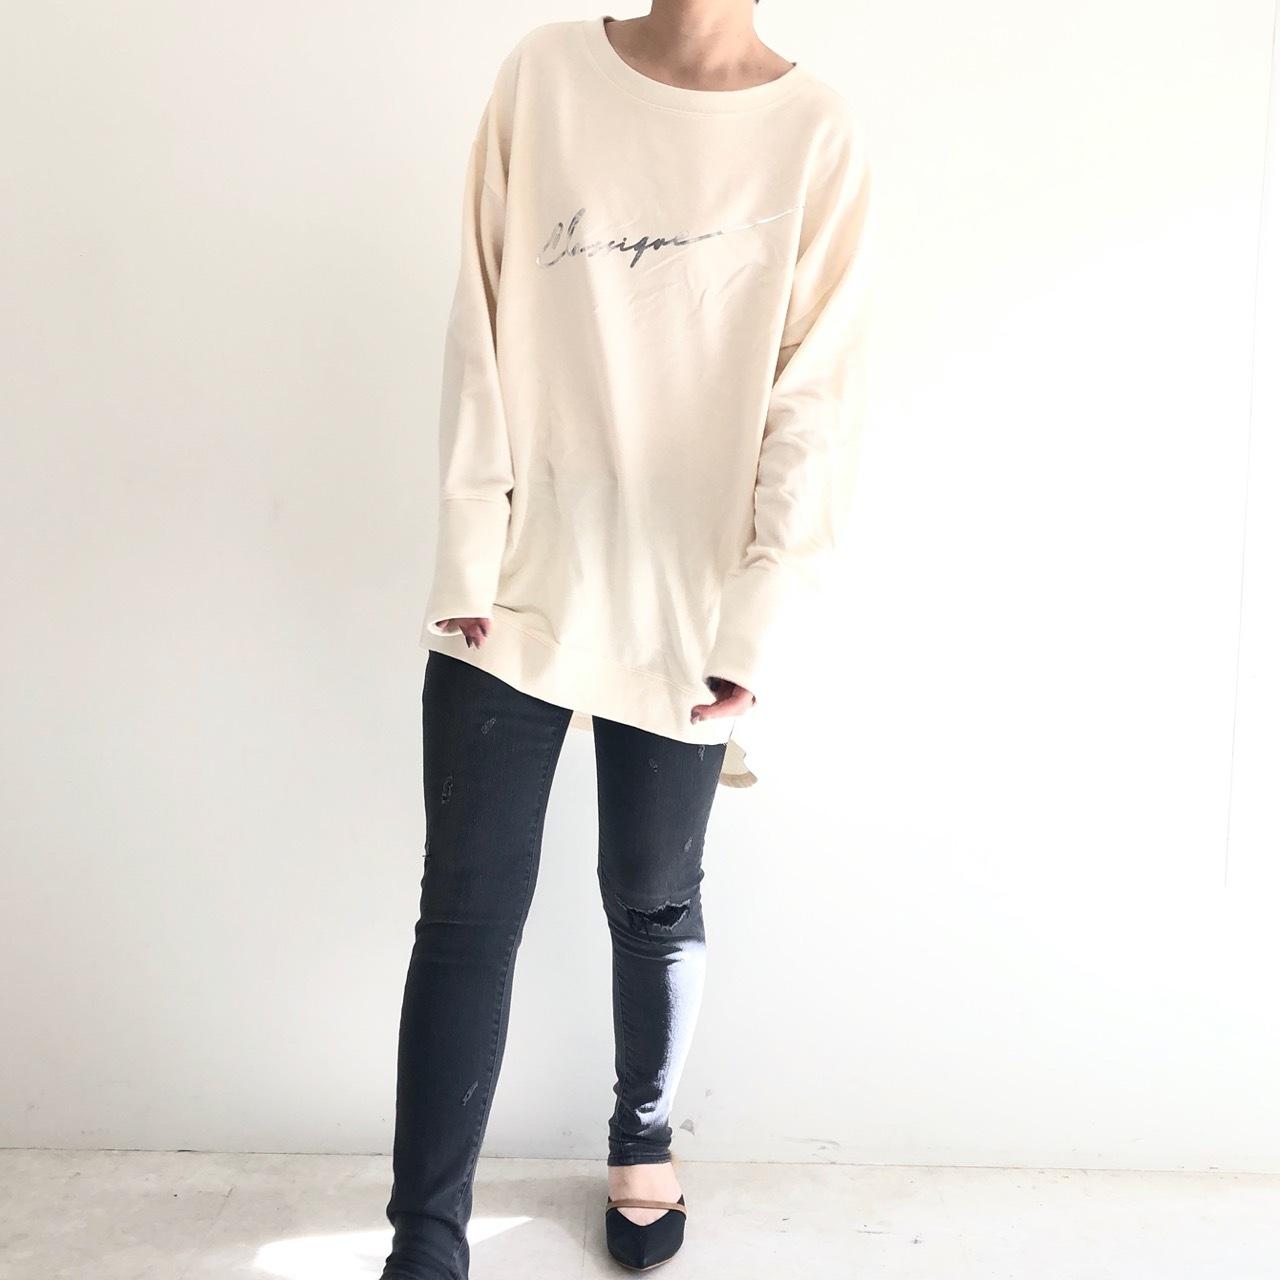 【 CHIGNONSTAR 】- 8692-366 - ロゴプリントTeeシャツ